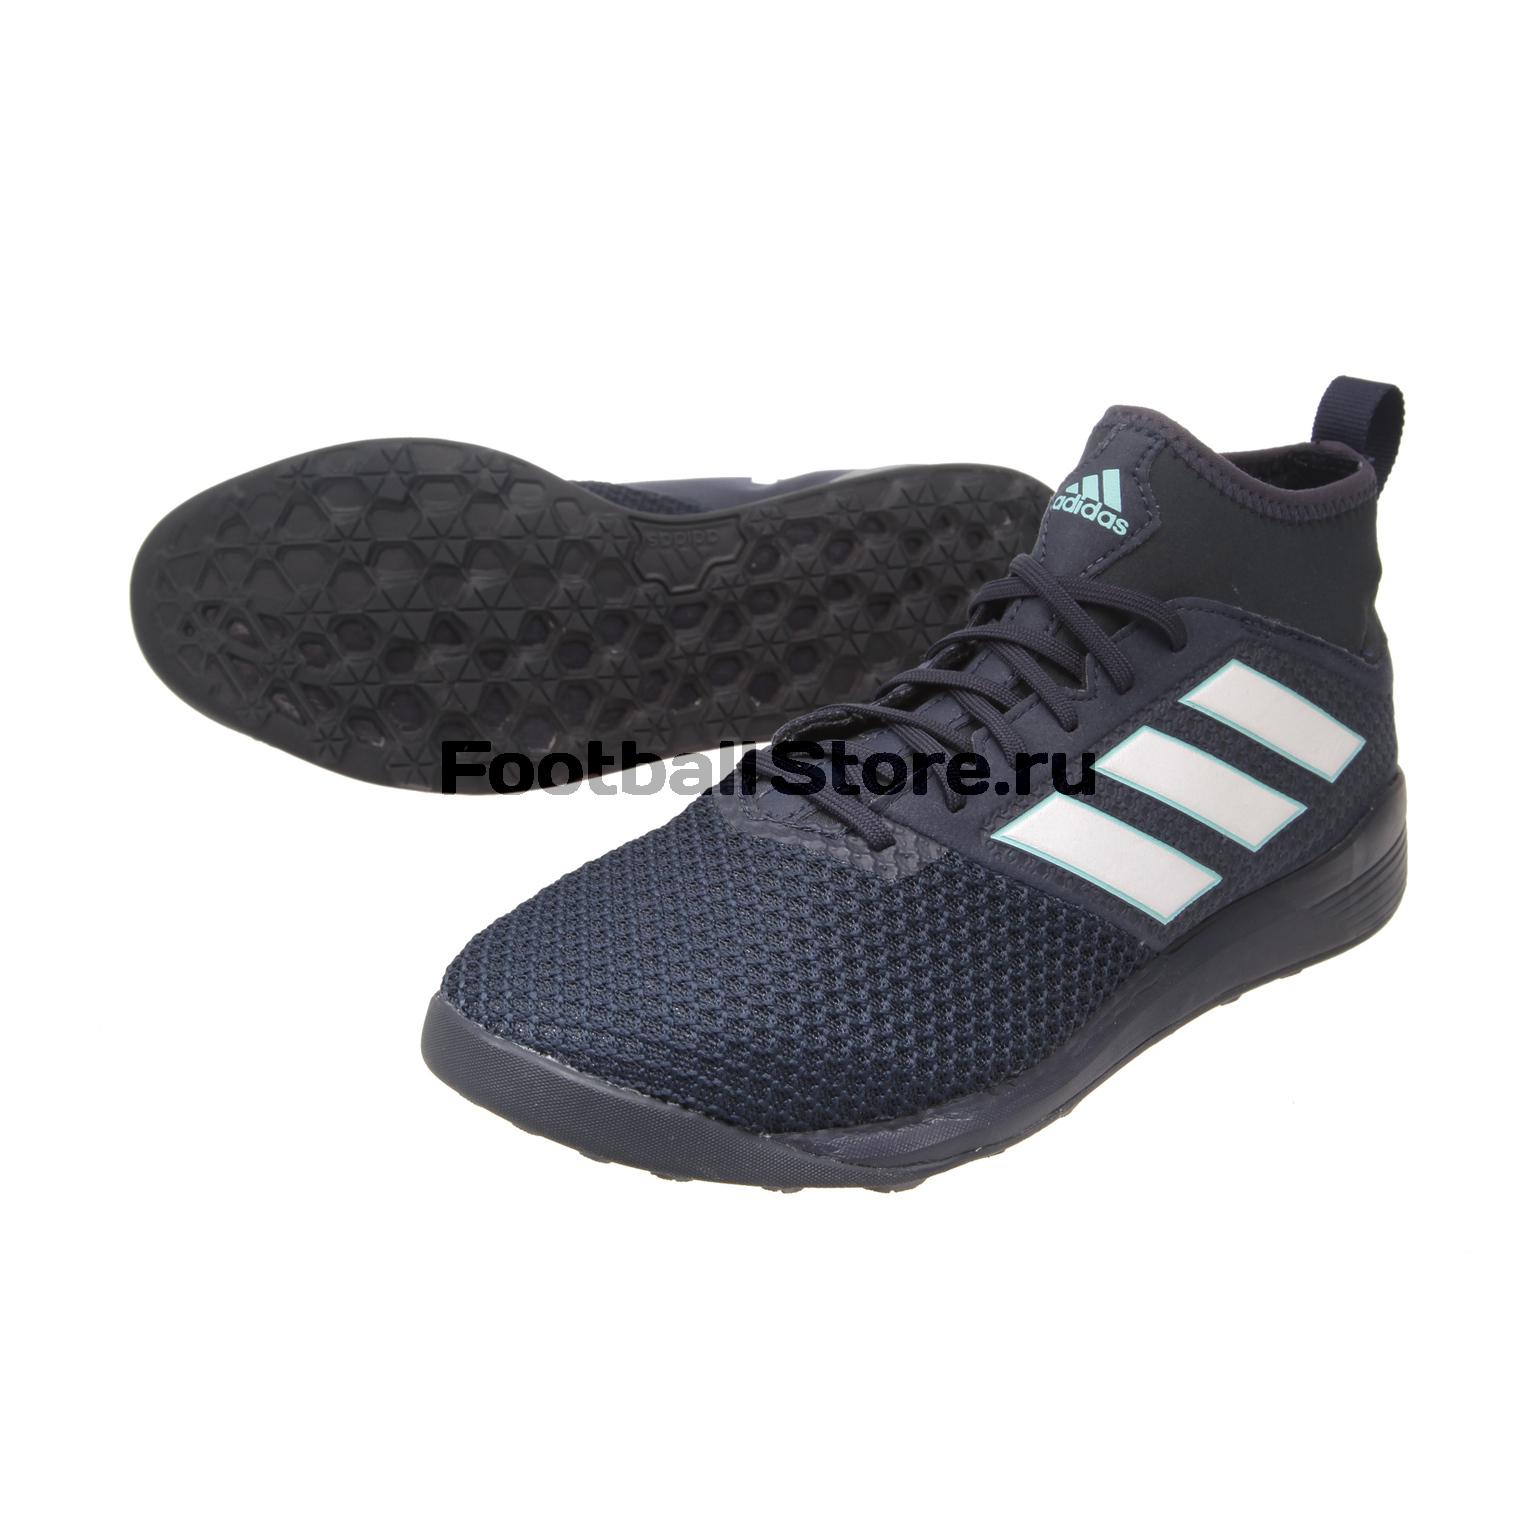 Шиповки Adidas Шиповки Adidas Ace Tango 17.3 TR CG2750